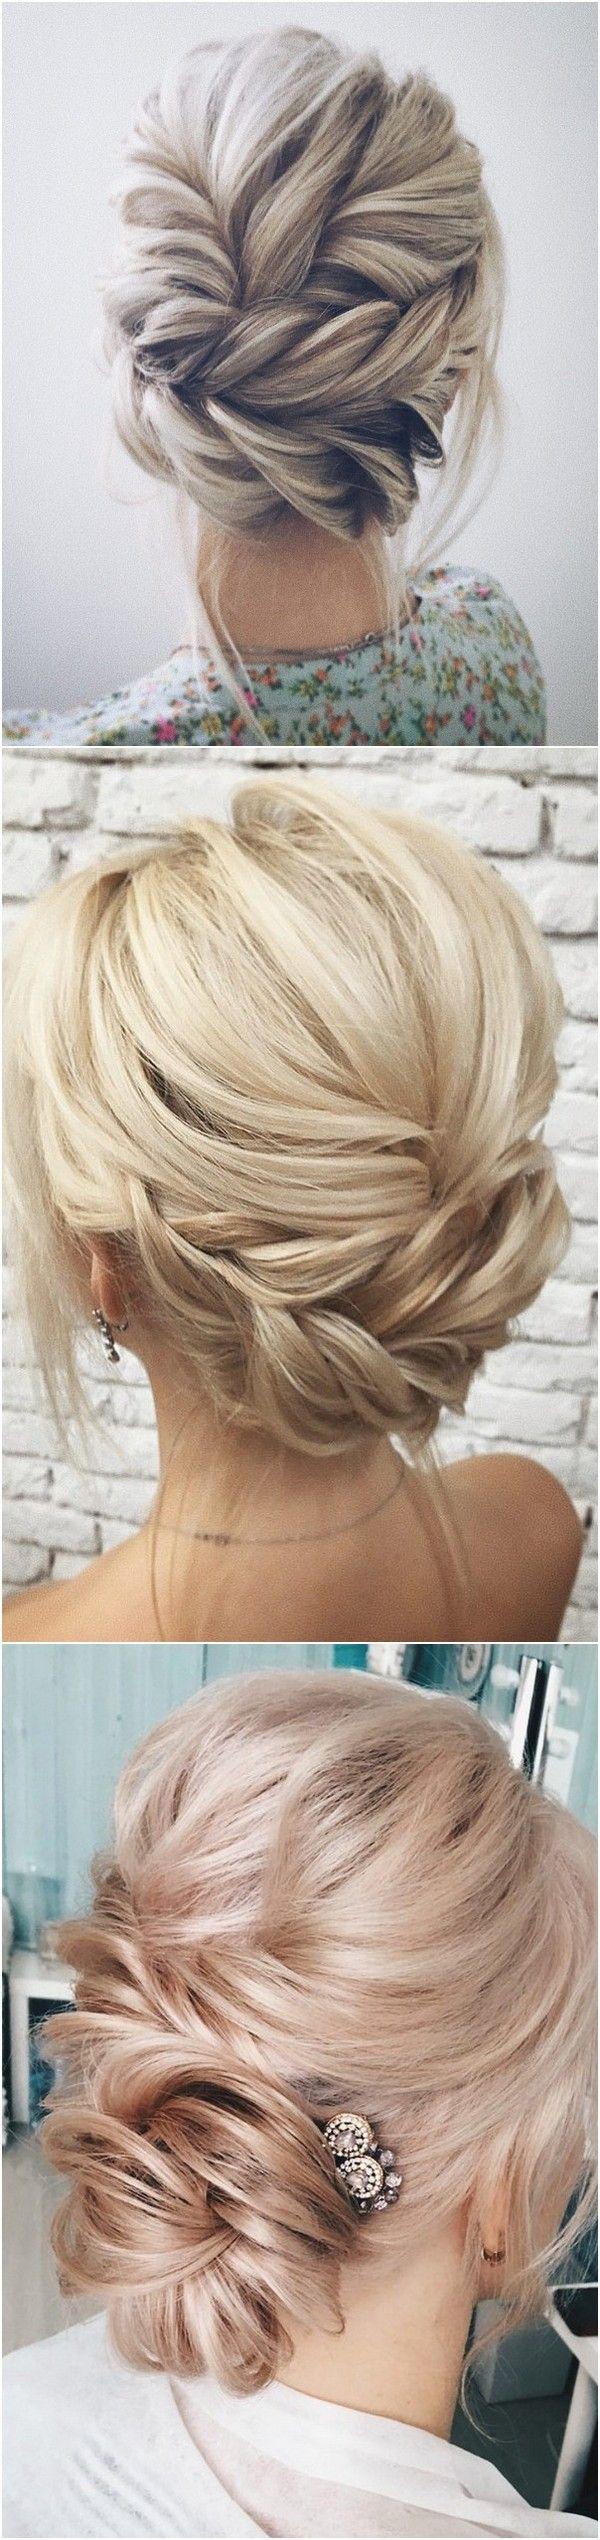 Twisted wedding updo hairstyle hair pinterest wedding updo